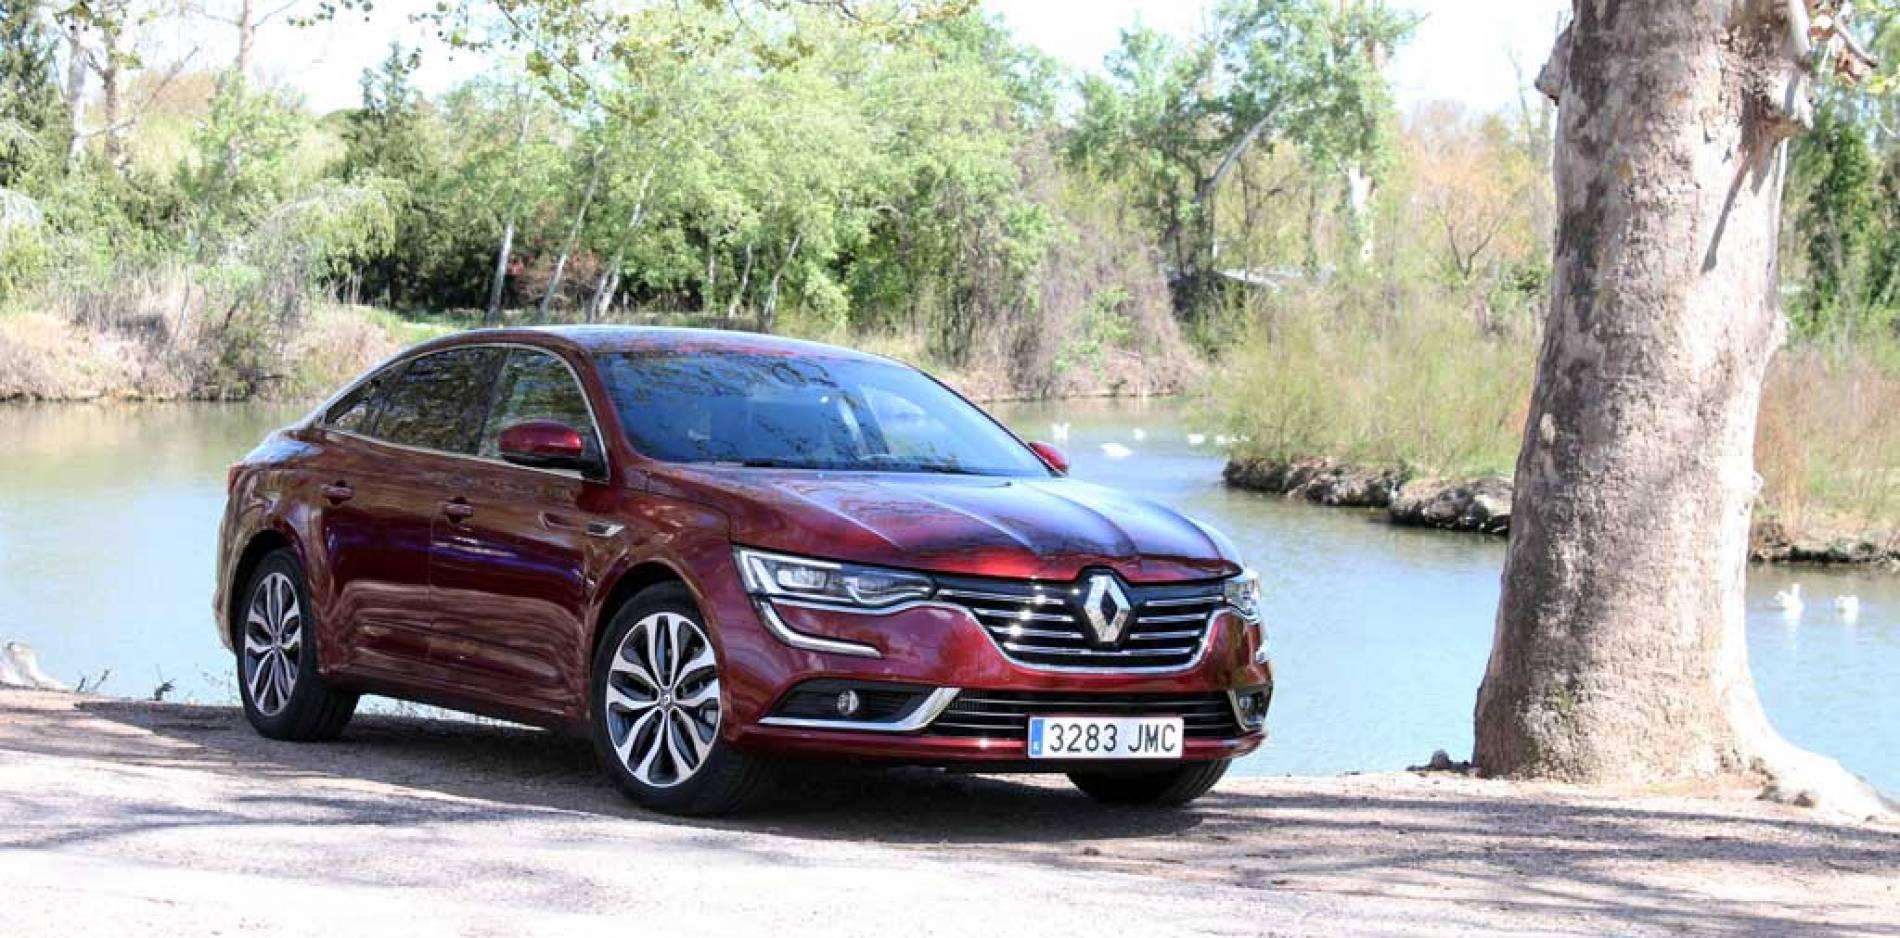 Prueba Renault Talisman Energy TCe 200 EDC, altas miras